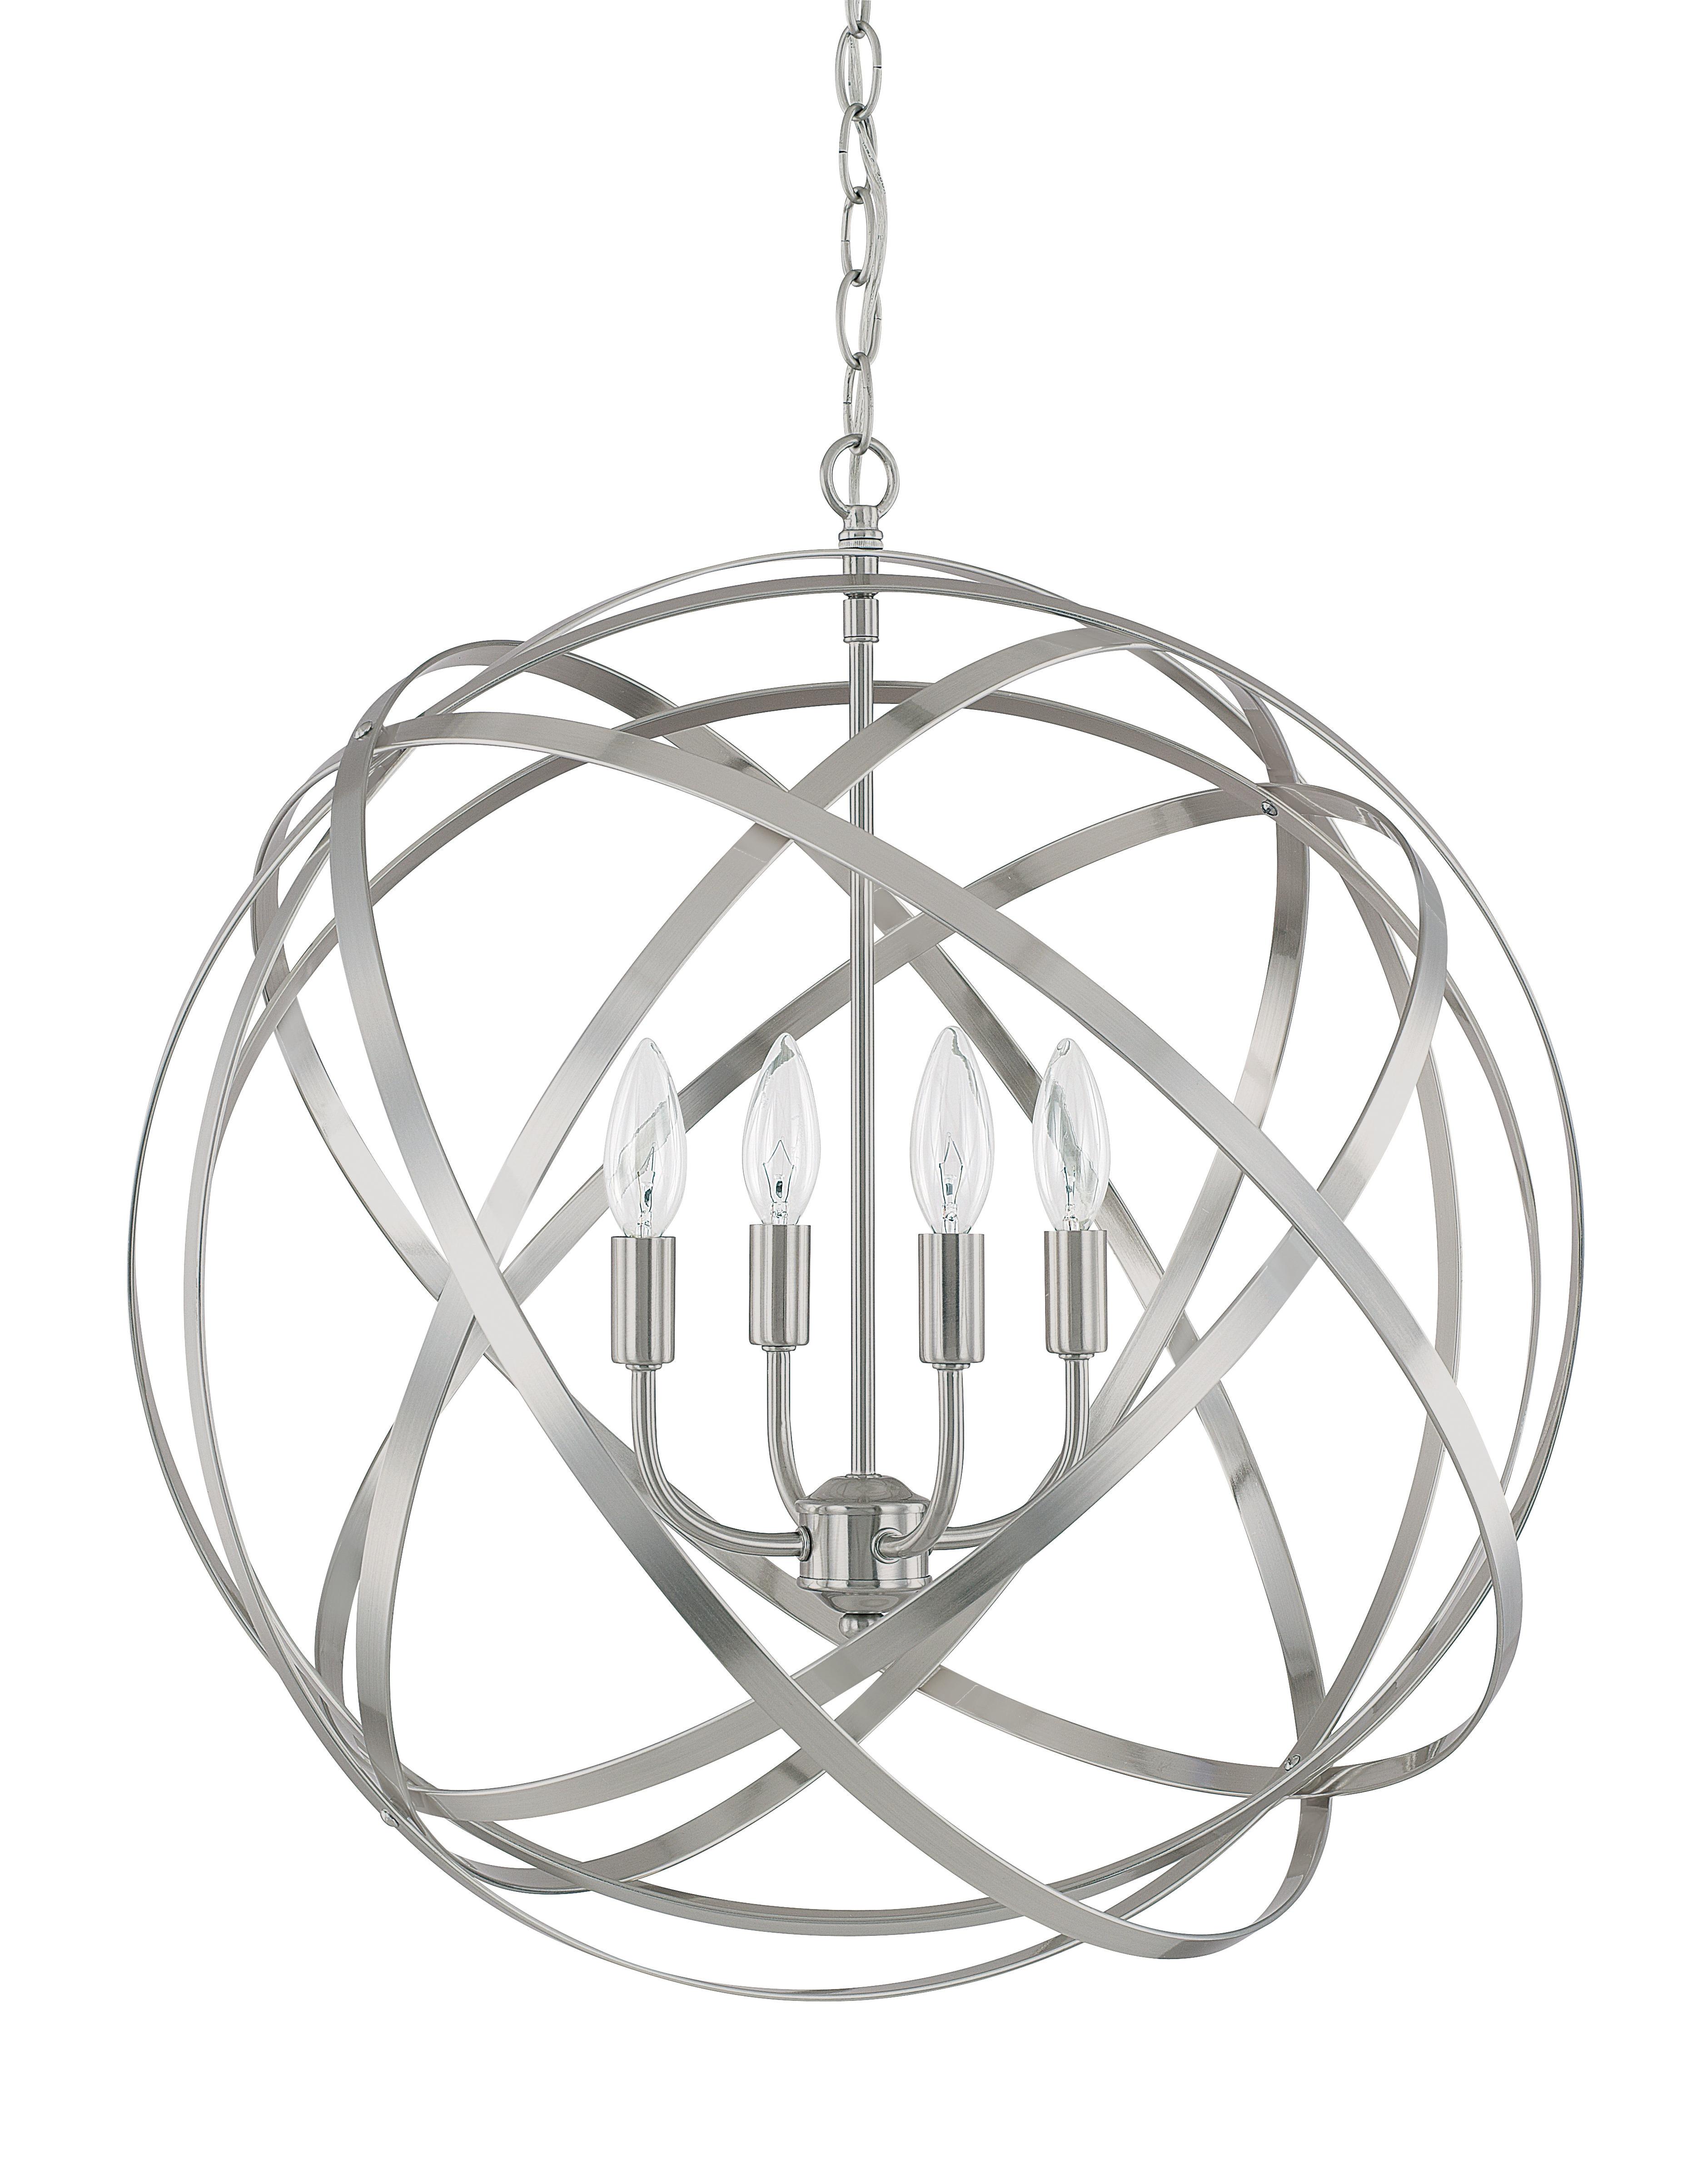 2019 Cavanagh 4 Light Geometric Chandeliers With Kierra 4 Light Unique / Statement Chandelier (View 17 of 25)